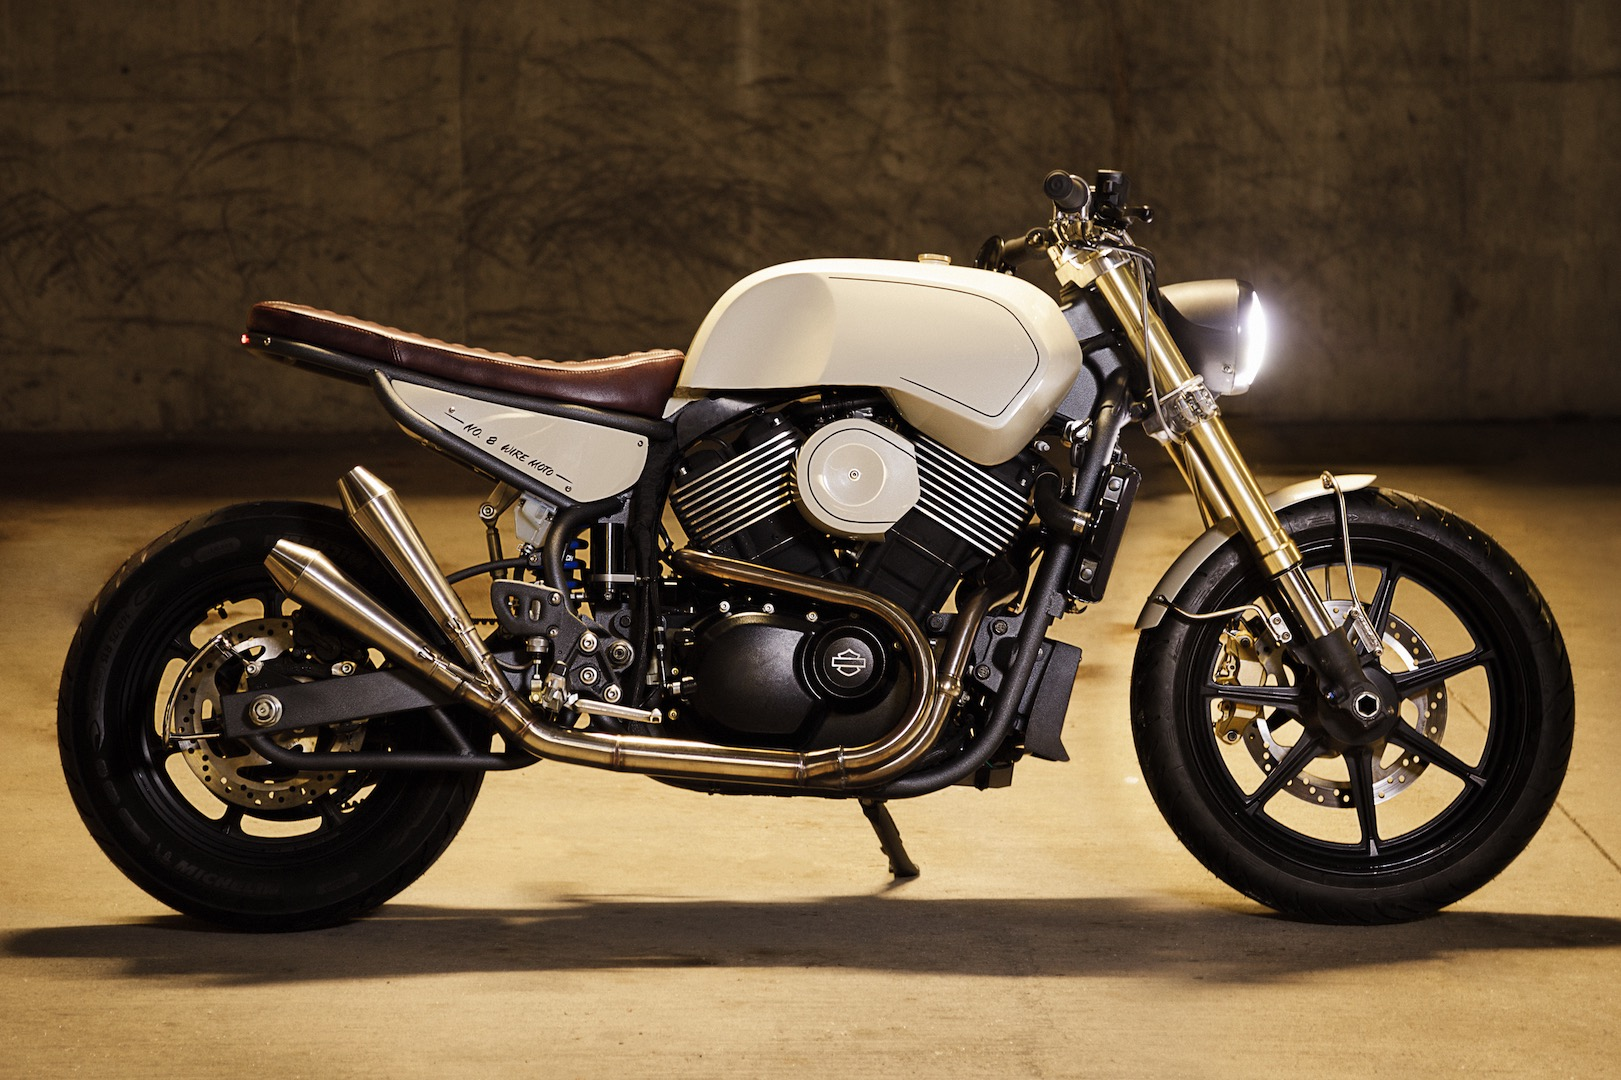 hight resolution of 8 wire motorcycles custom harley davidson street xg750 exposed